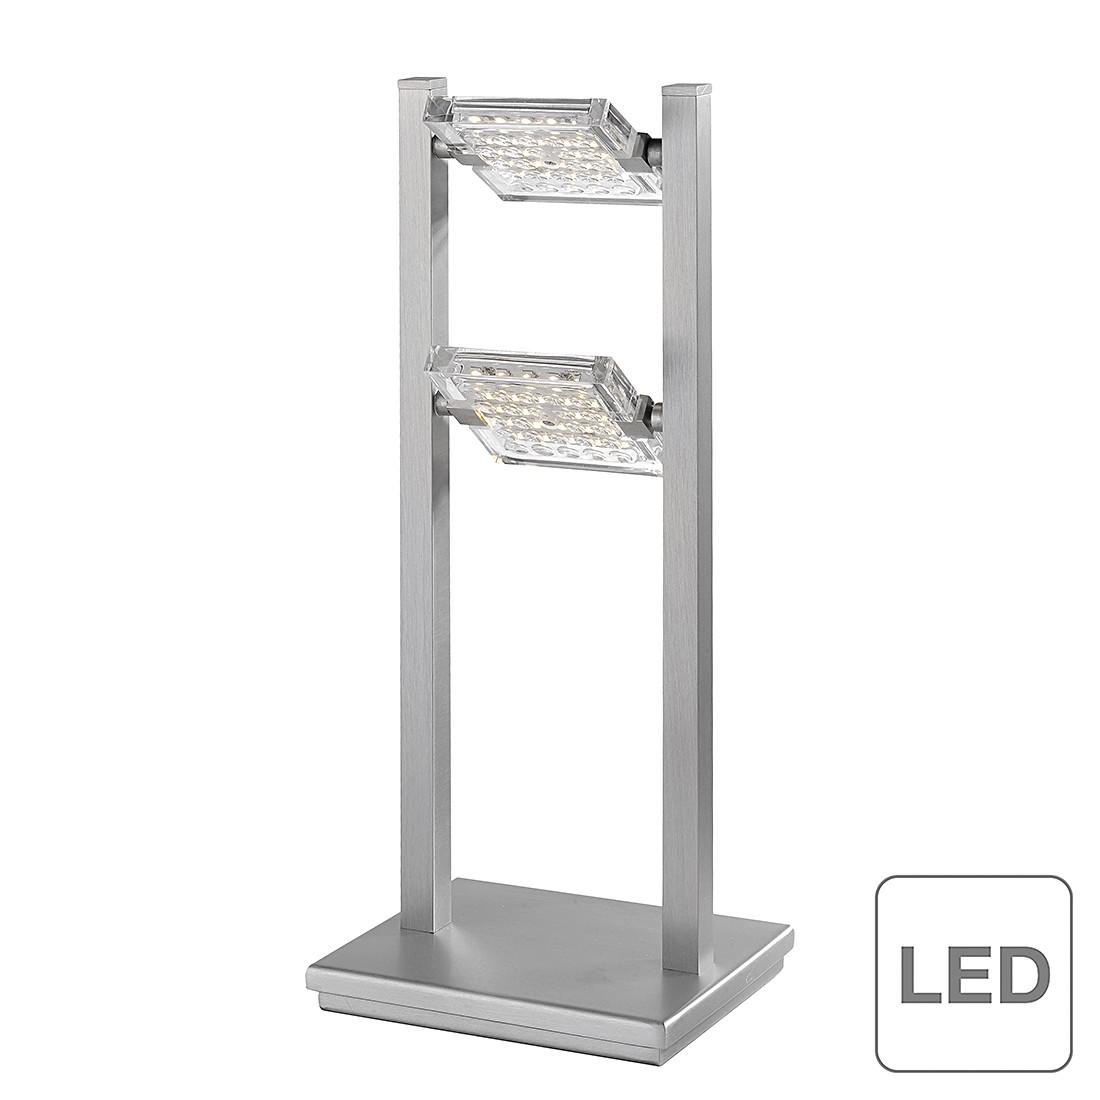 EEK A+, LED-Tischleuchte Futura - Metall/ Glas - Silber, Paul Neuhaus